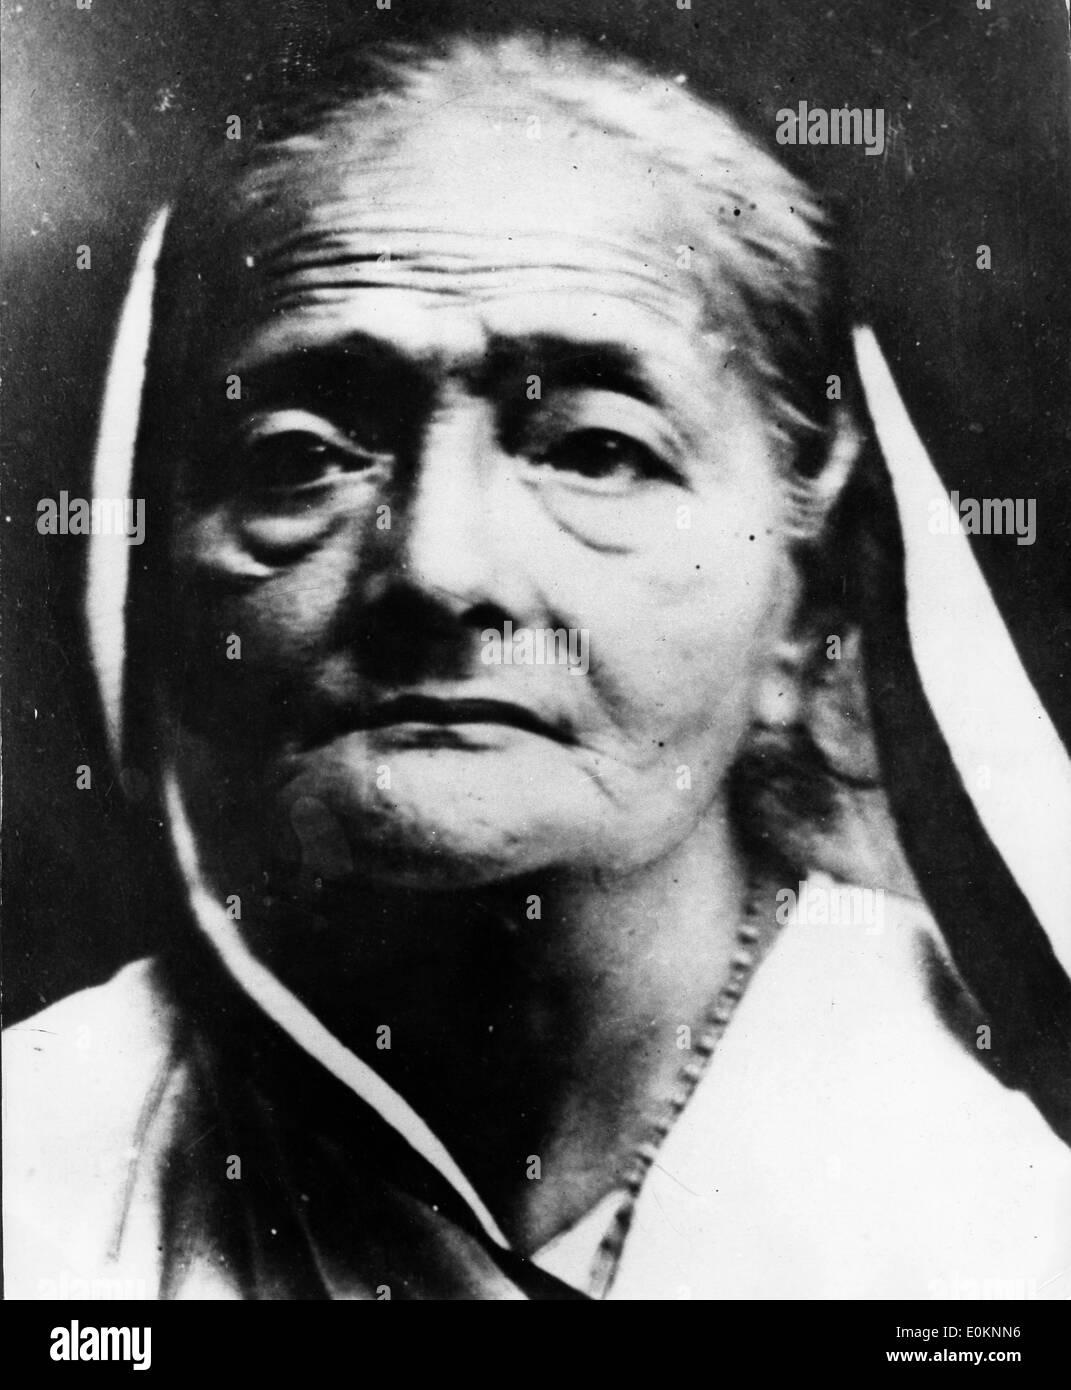 Portrait of Mahatma Ghandi's wife Kasturba Gandhi - Stock Image